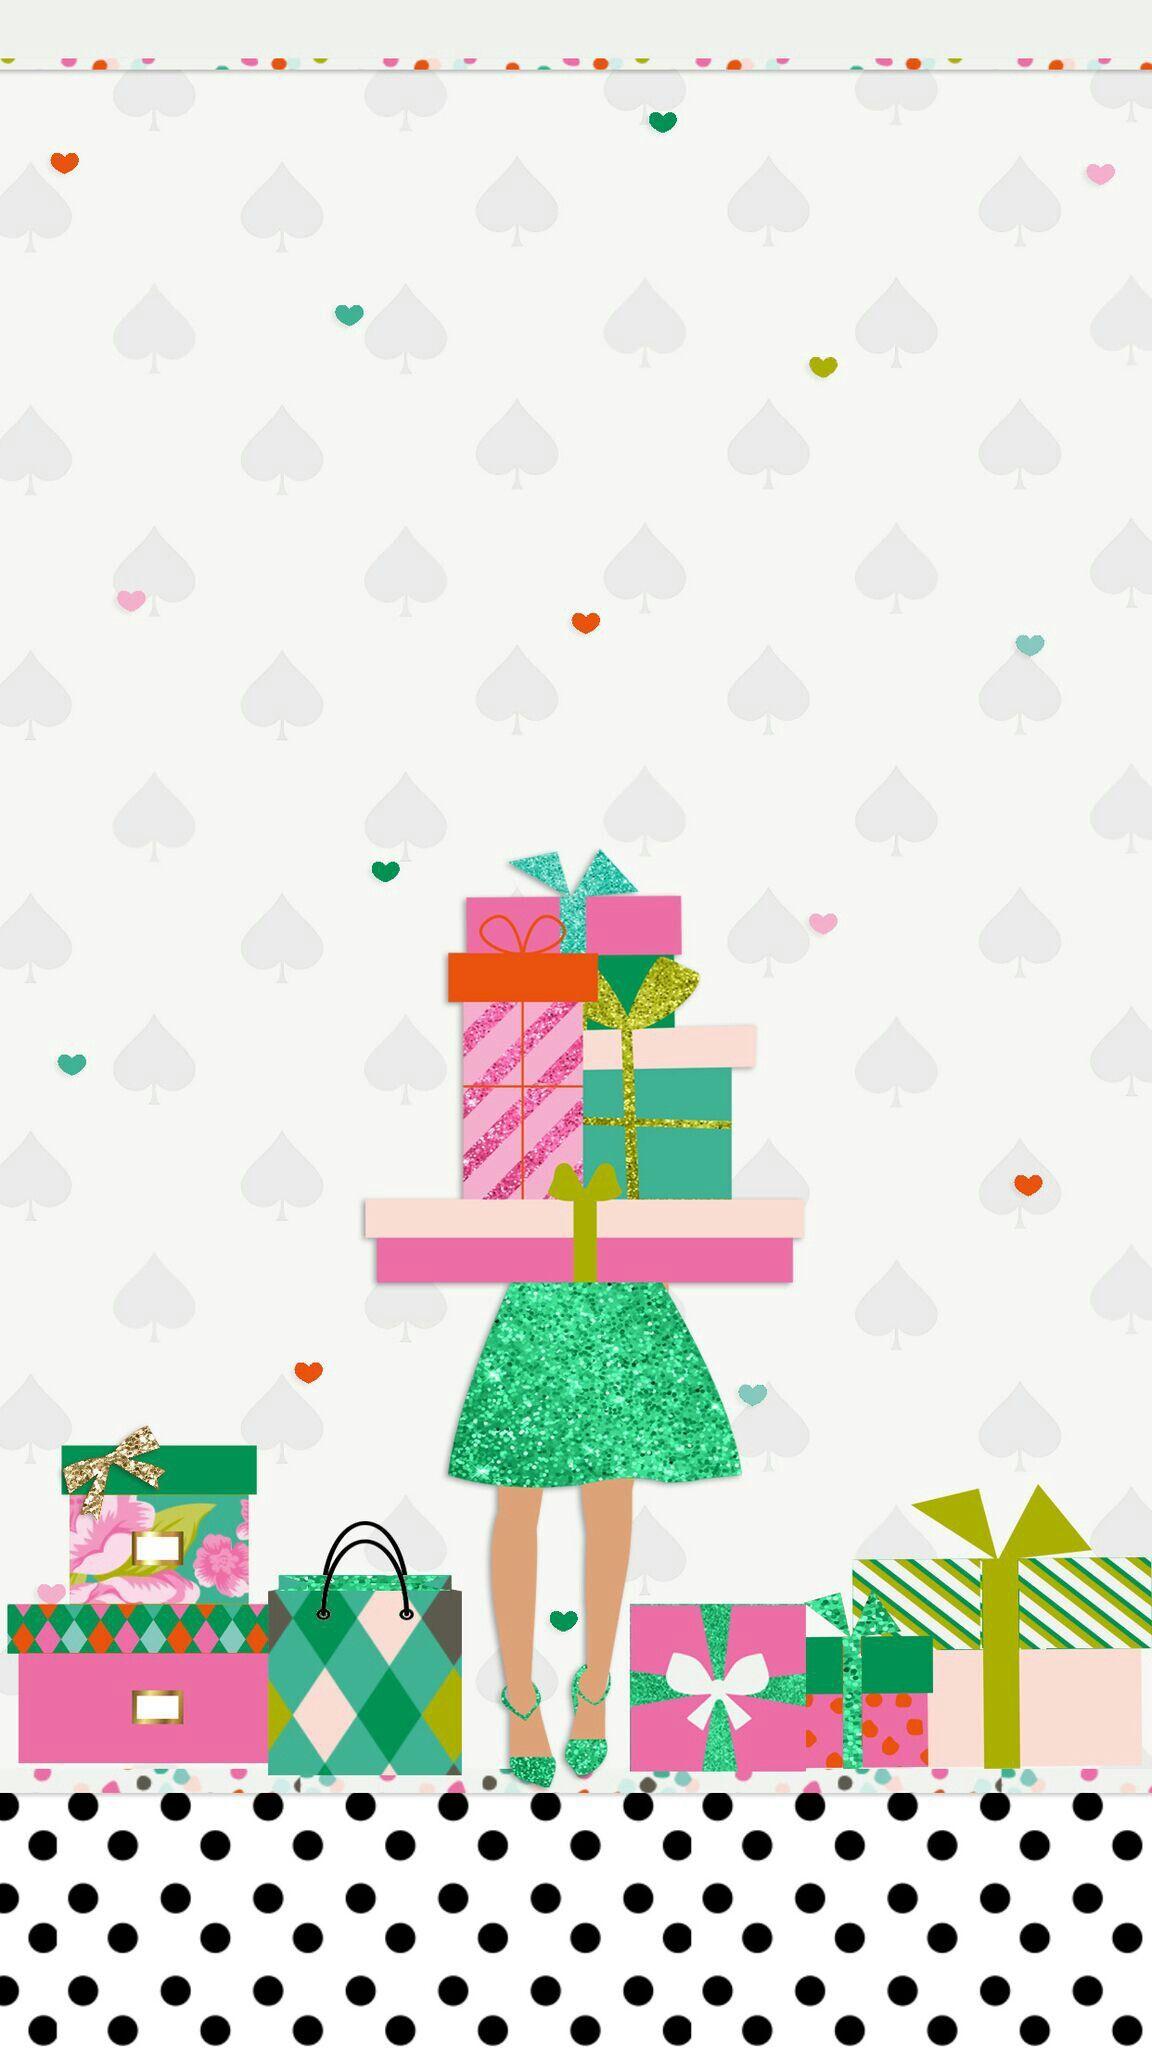 iPhone Wall: Christmas tjn | Christmas | Pinterest | Wallpaper and ...